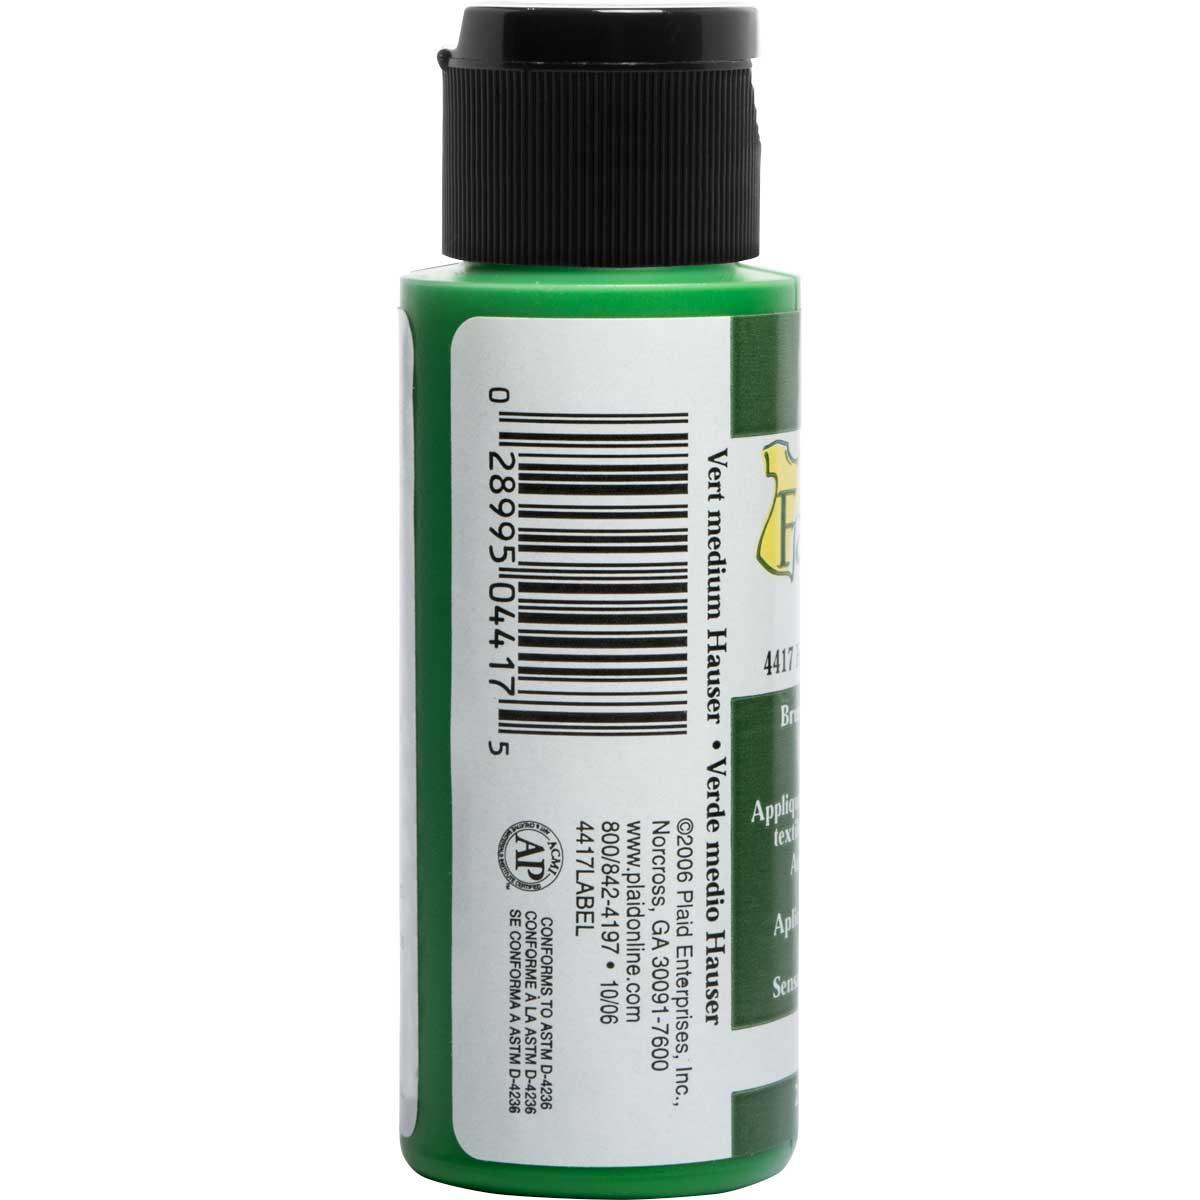 FolkArt ® Fabric™ Paint - Brush On - Hauser Green Medium - 4417